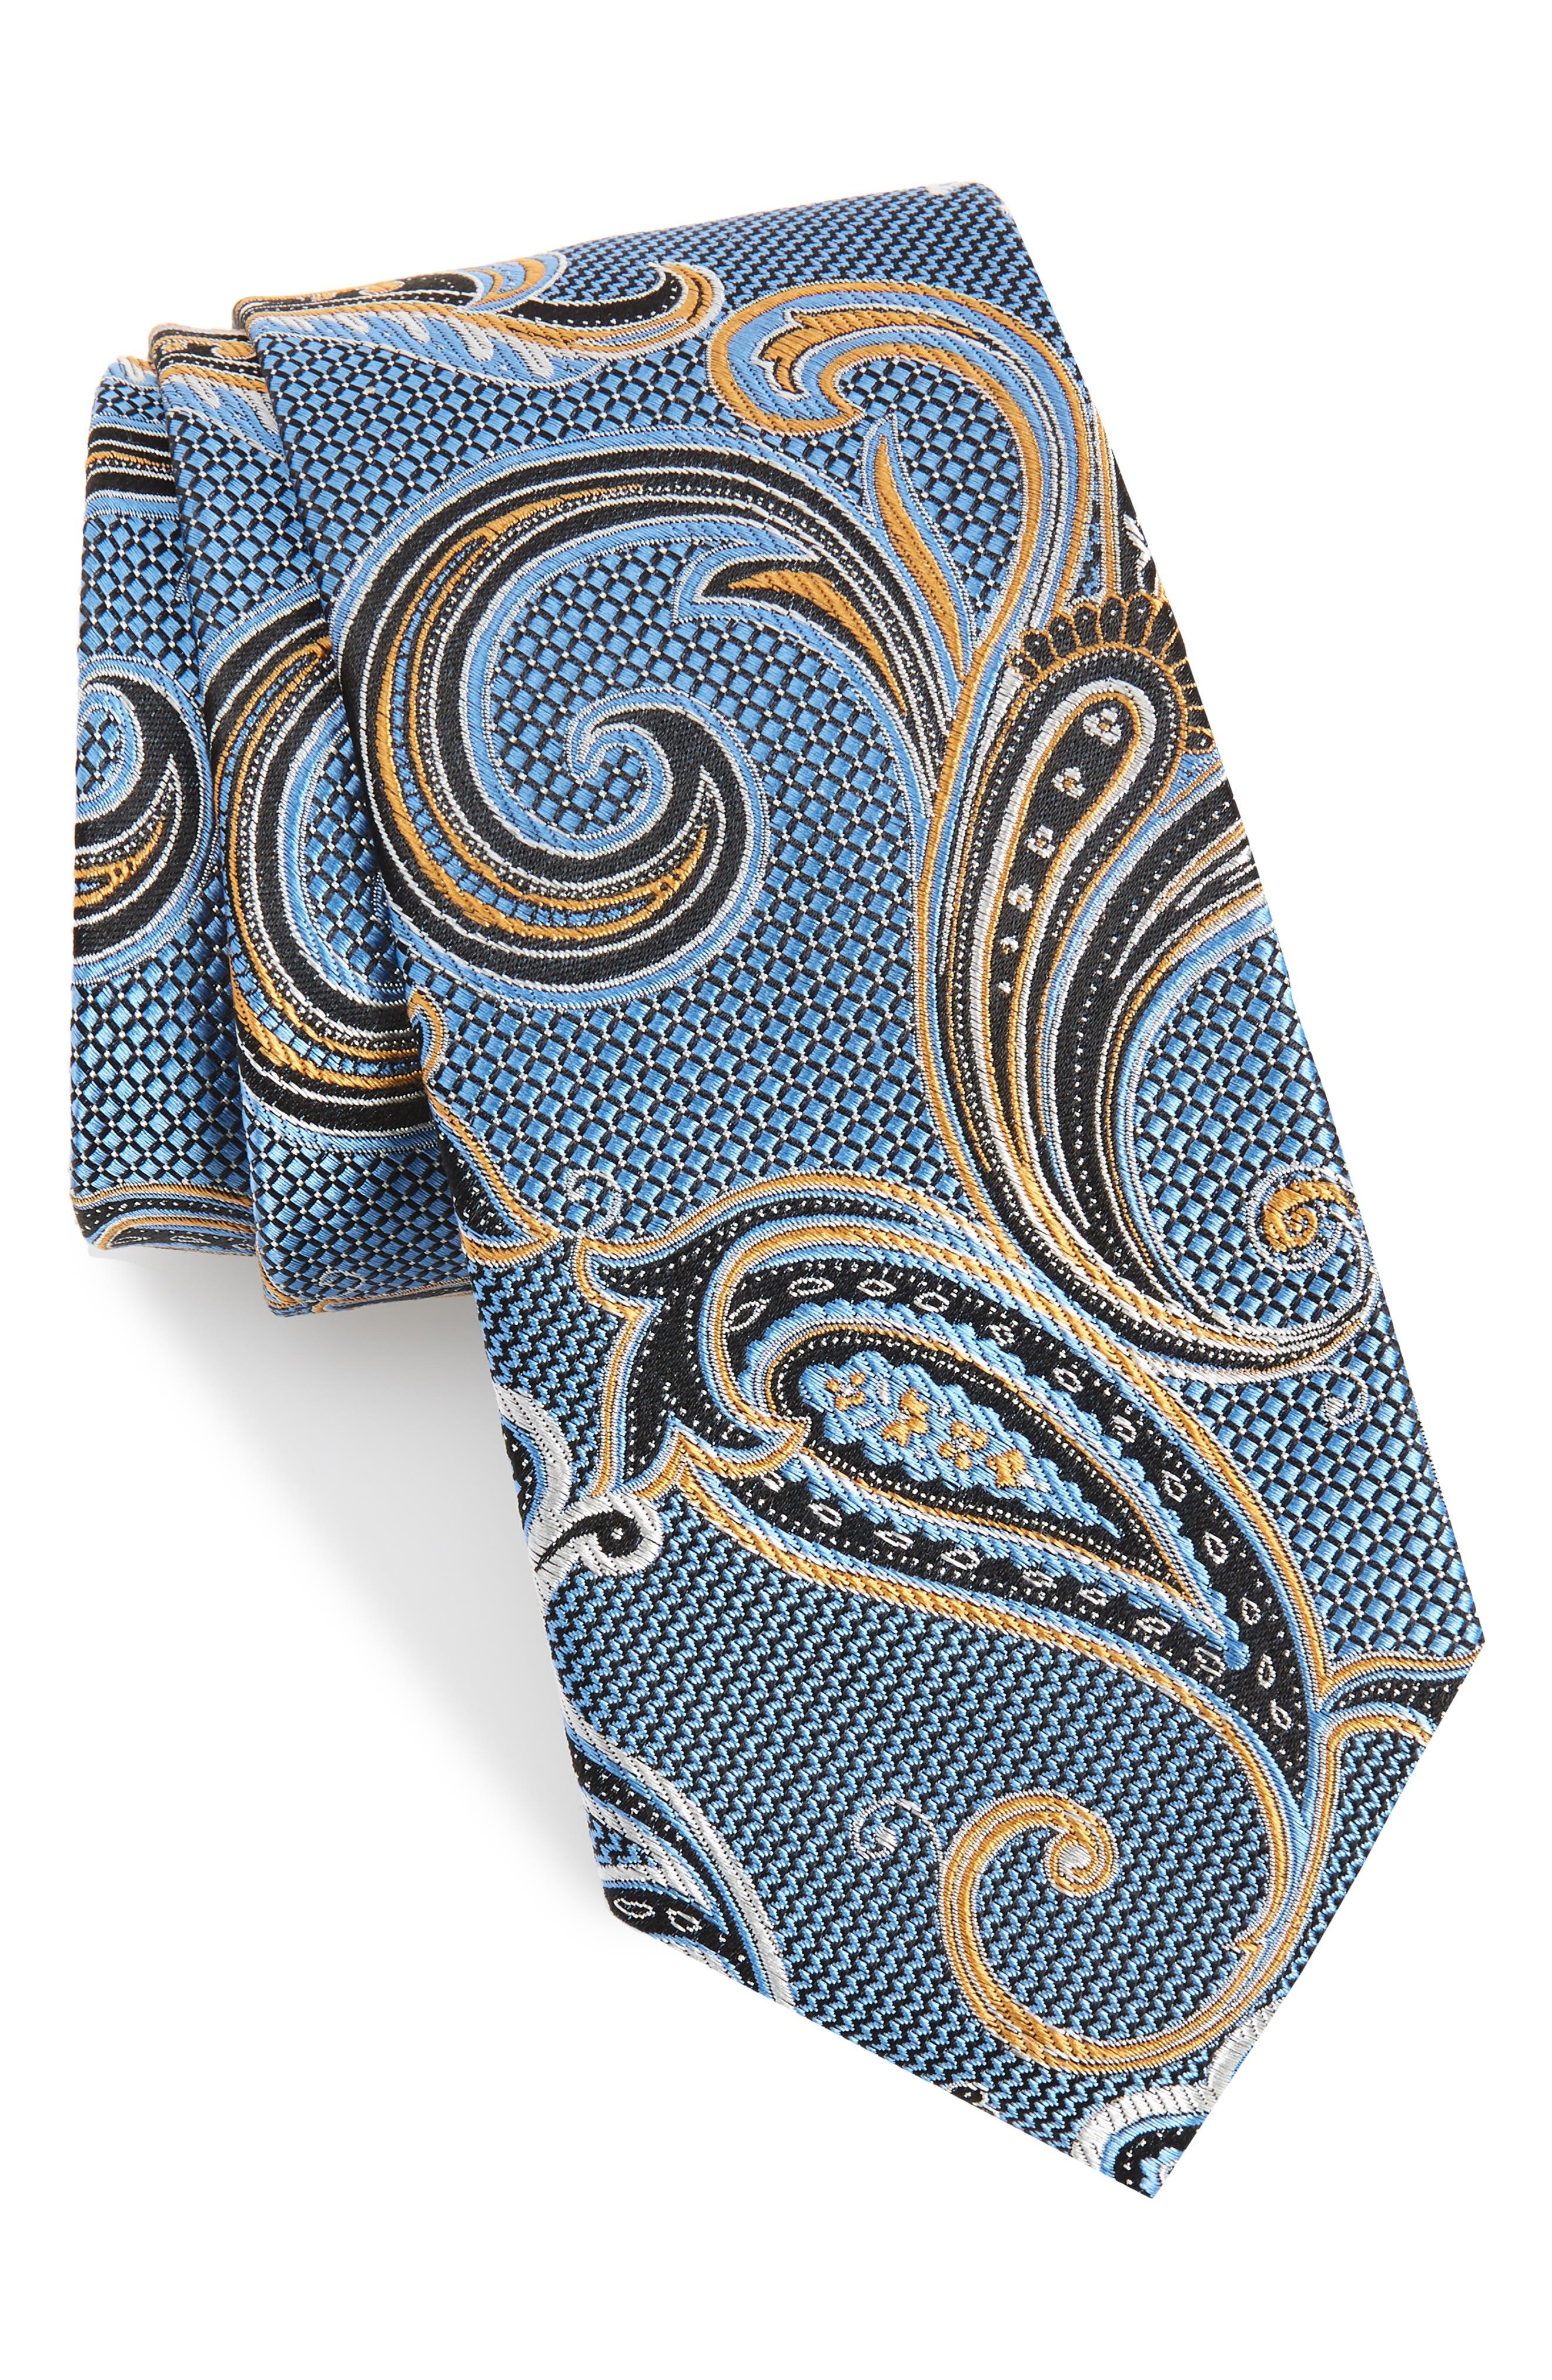 NORDSTROM MEN'S SHOP, Bryce Paisley Silk Tie, Main thumbnail 1, color, BLUE